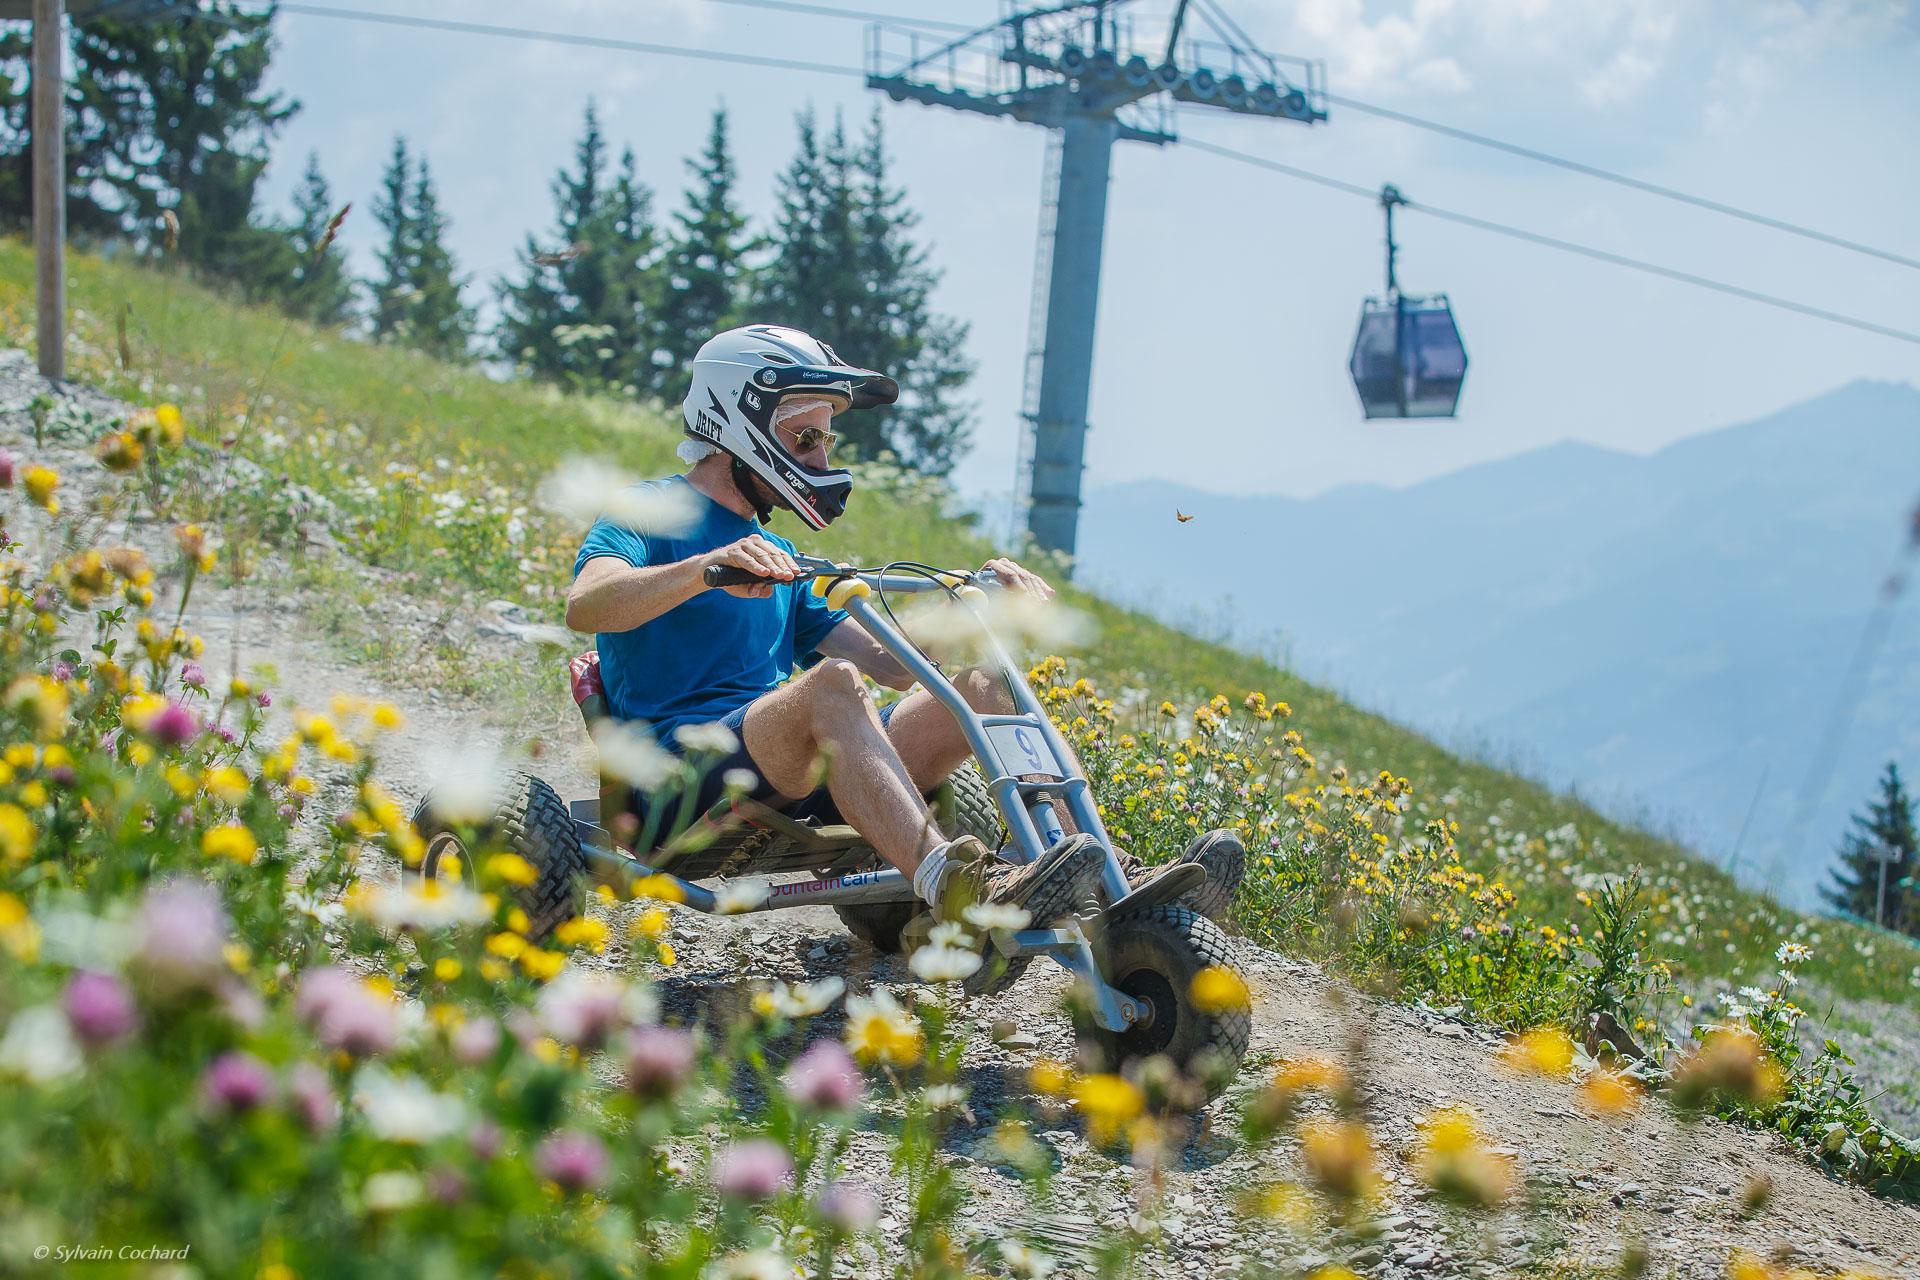 Mountaincart @Sylvain Cochard